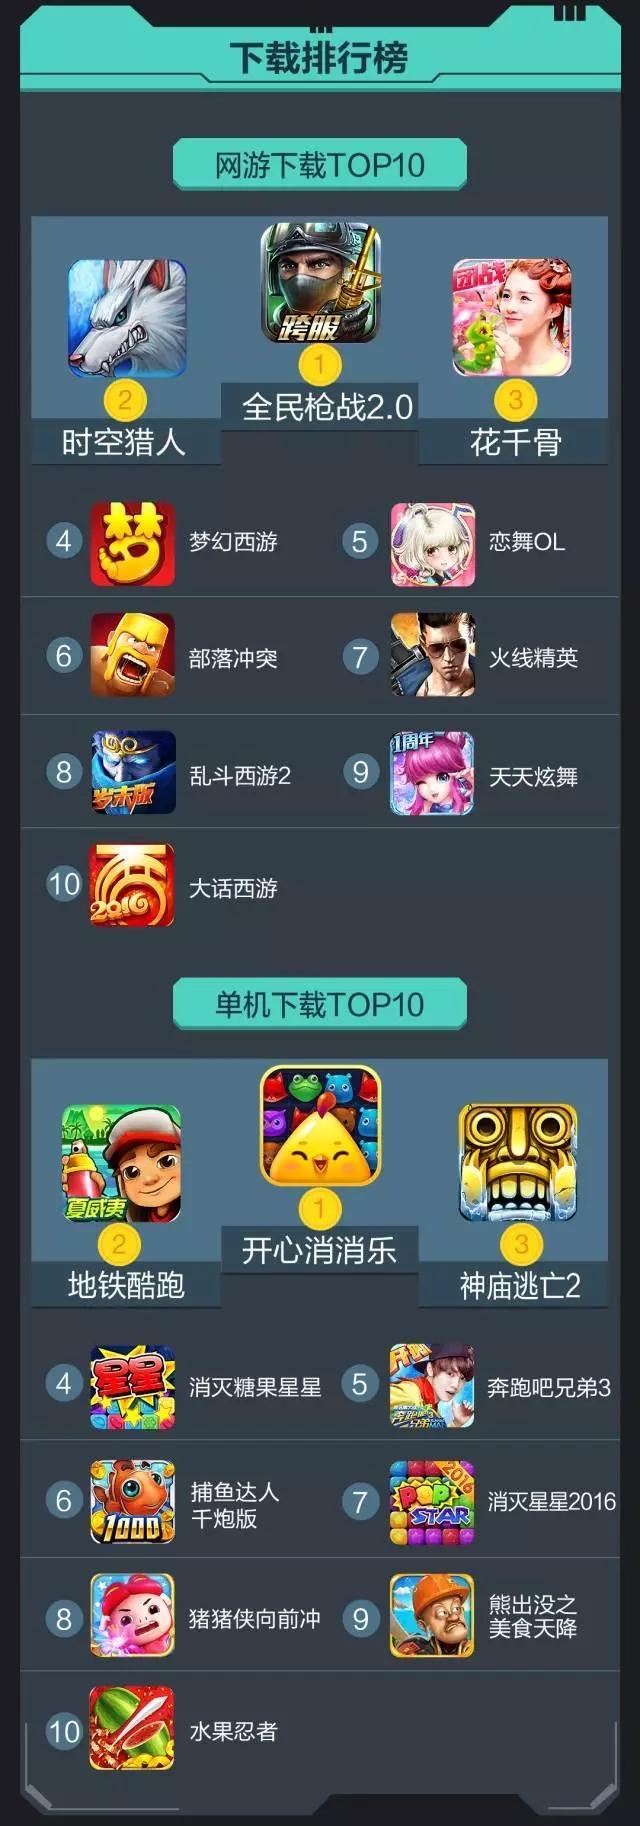 vivo 2月数据报告:单机游戏新增和活跃均达到峰值